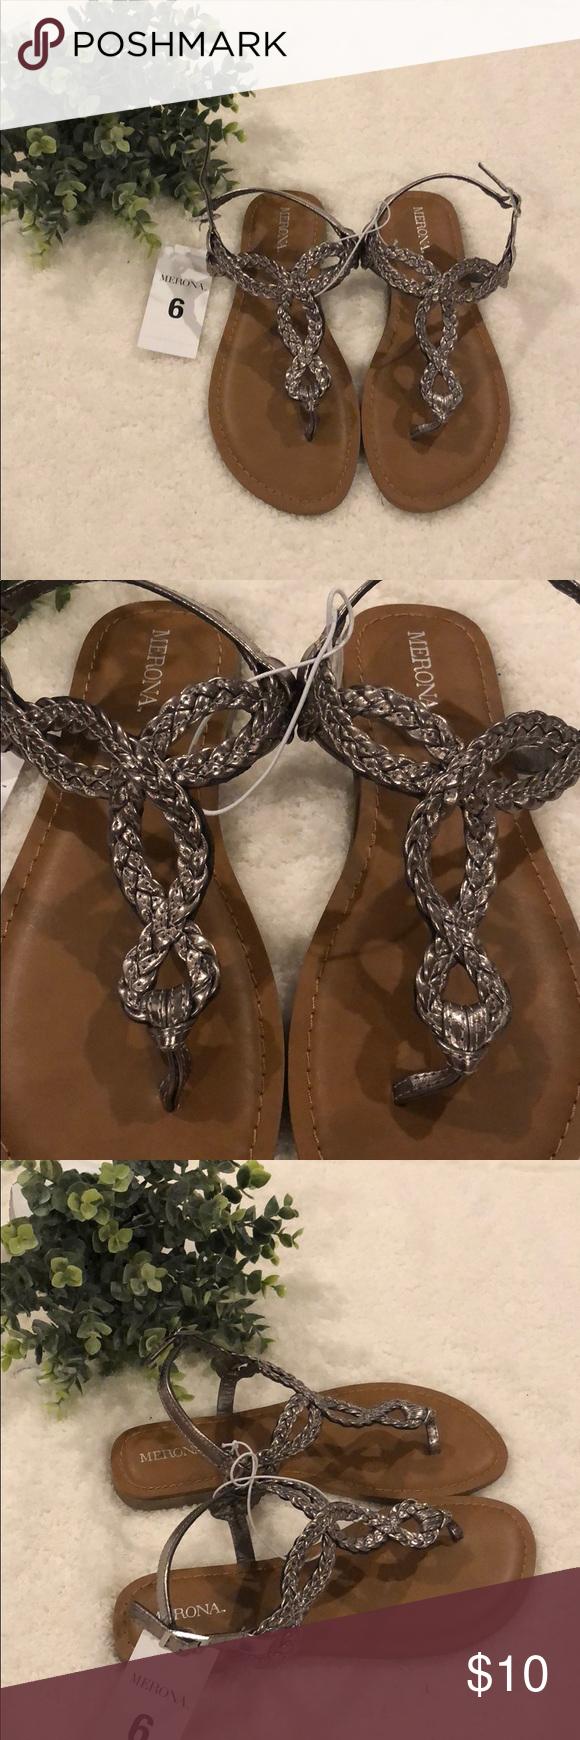 e993e90efab2 Merona Women s Size 6 Jana Strap Sandals Size  Women s 6 Color  pewter